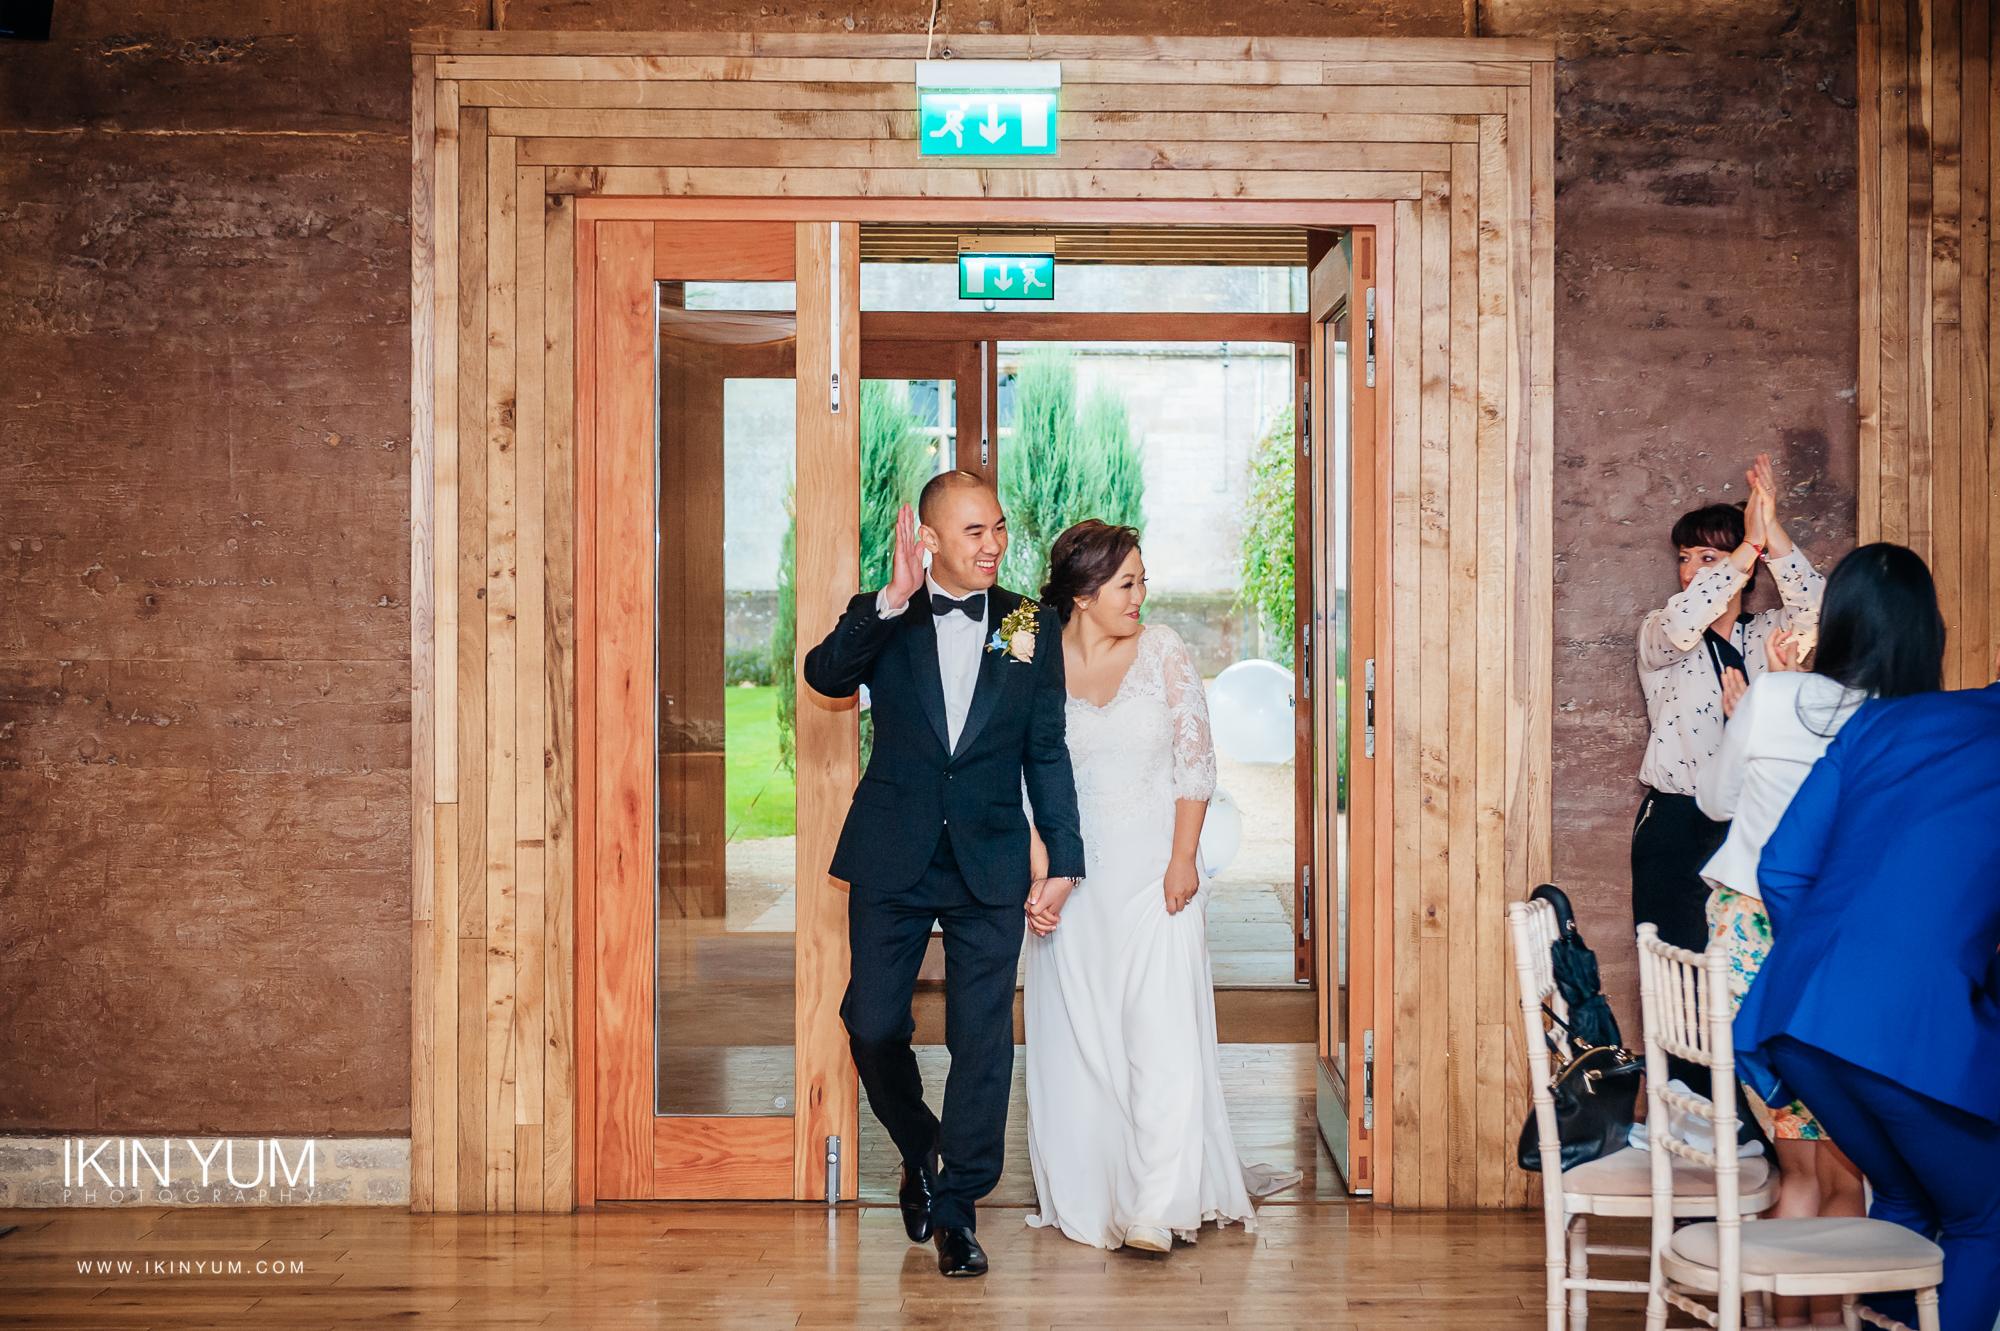 Elmore Court Wedding- Ikin Yum Photography-0082.jpg